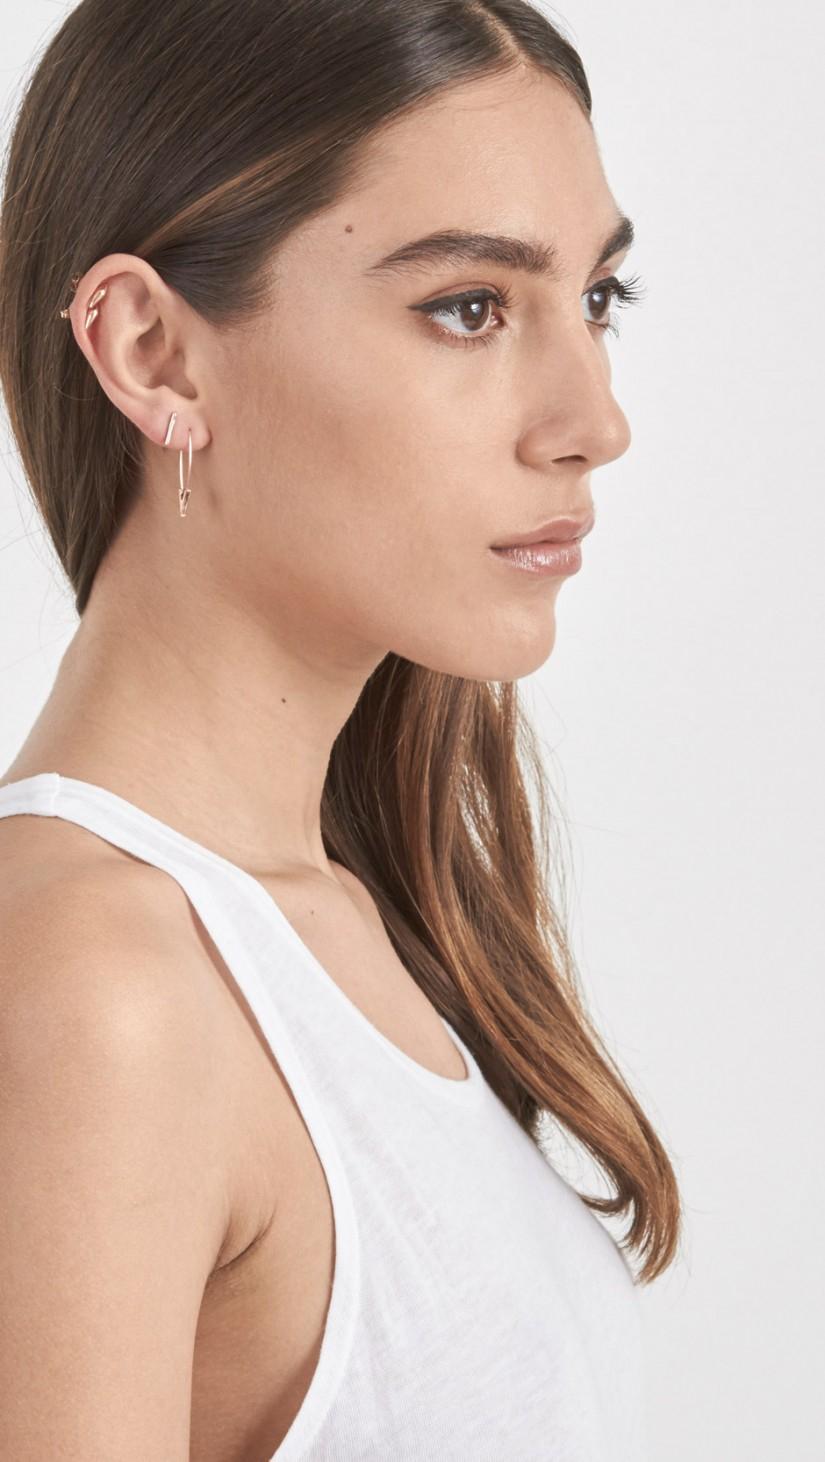 cff81a58b4960 Loren Stewart Metallic Triangle Safety Pin Earrings